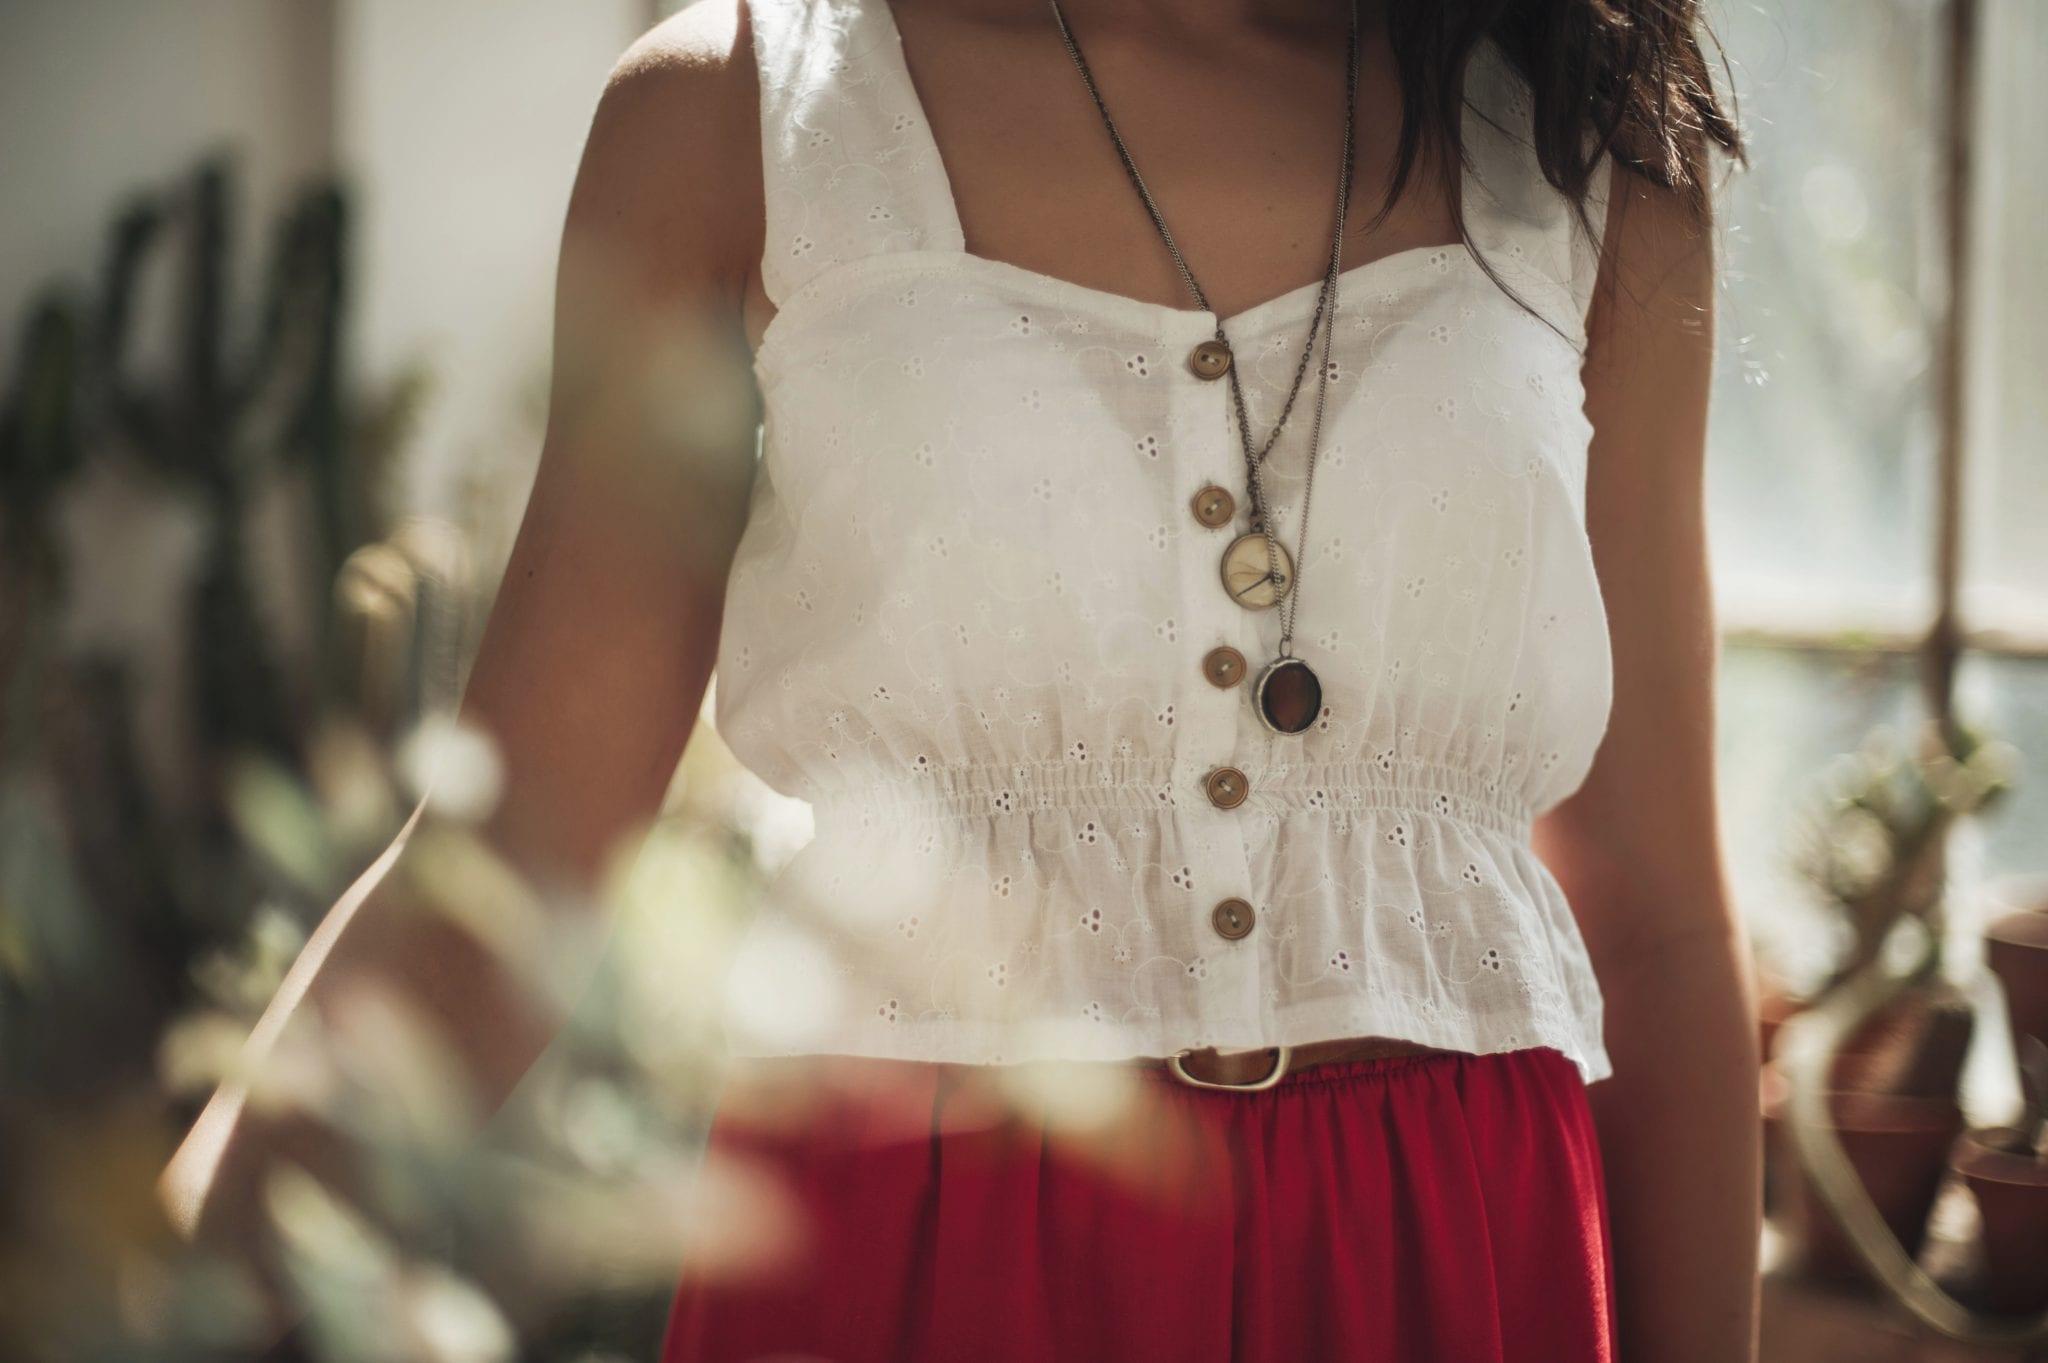 dettaglio camicia bianca - Carolina Emme - Le plume